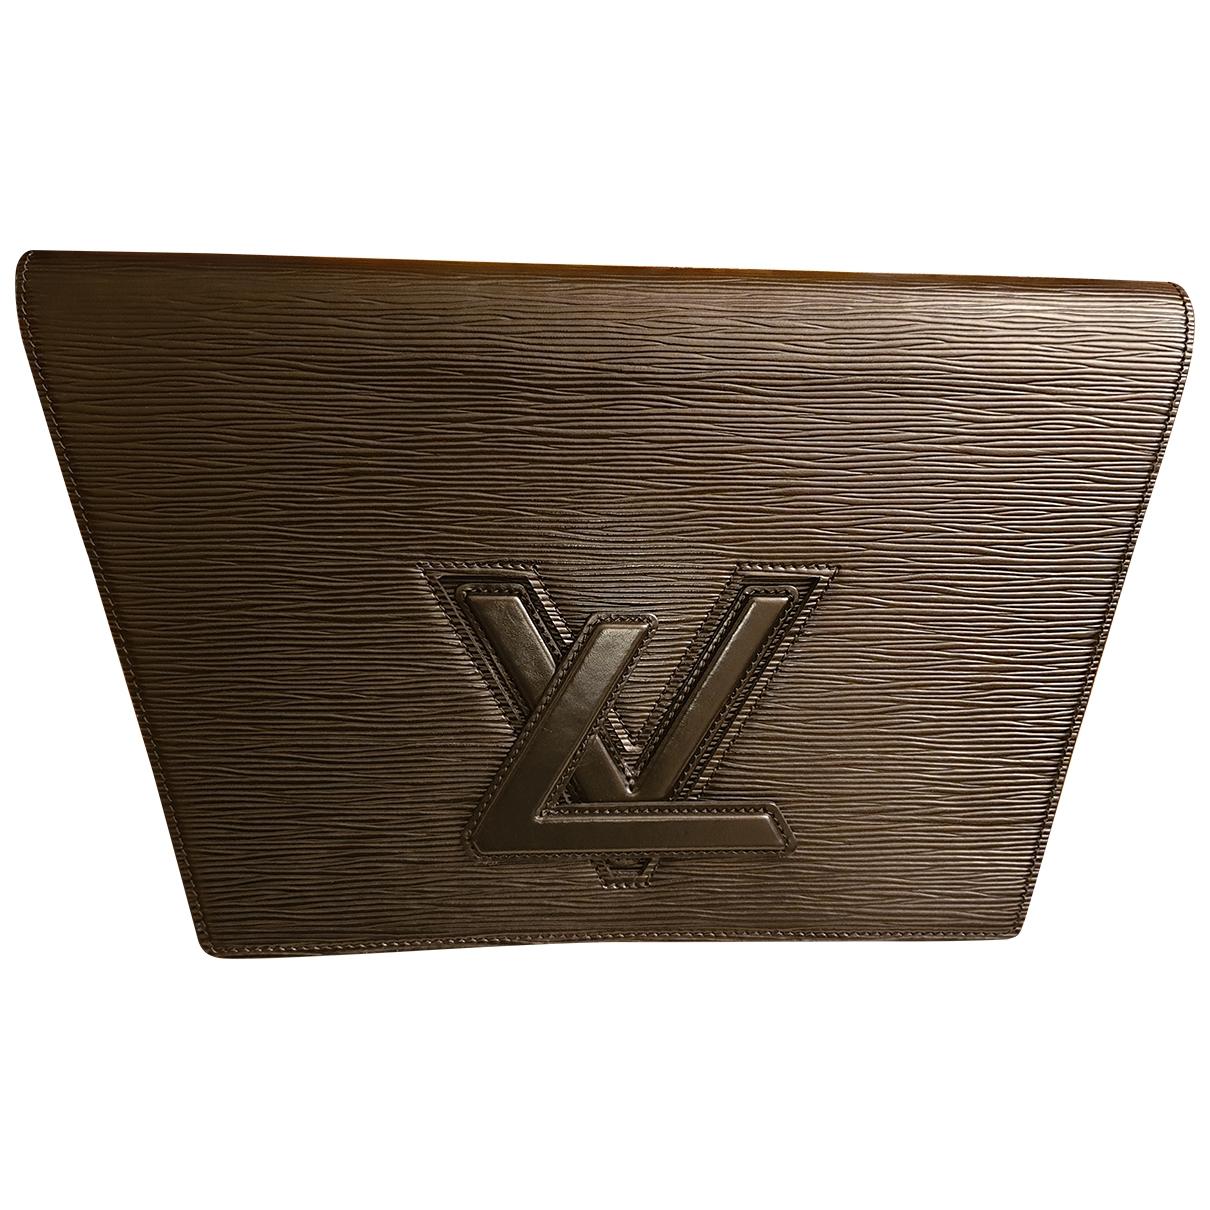 Pochette Trapeze de Cuero Louis Vuitton